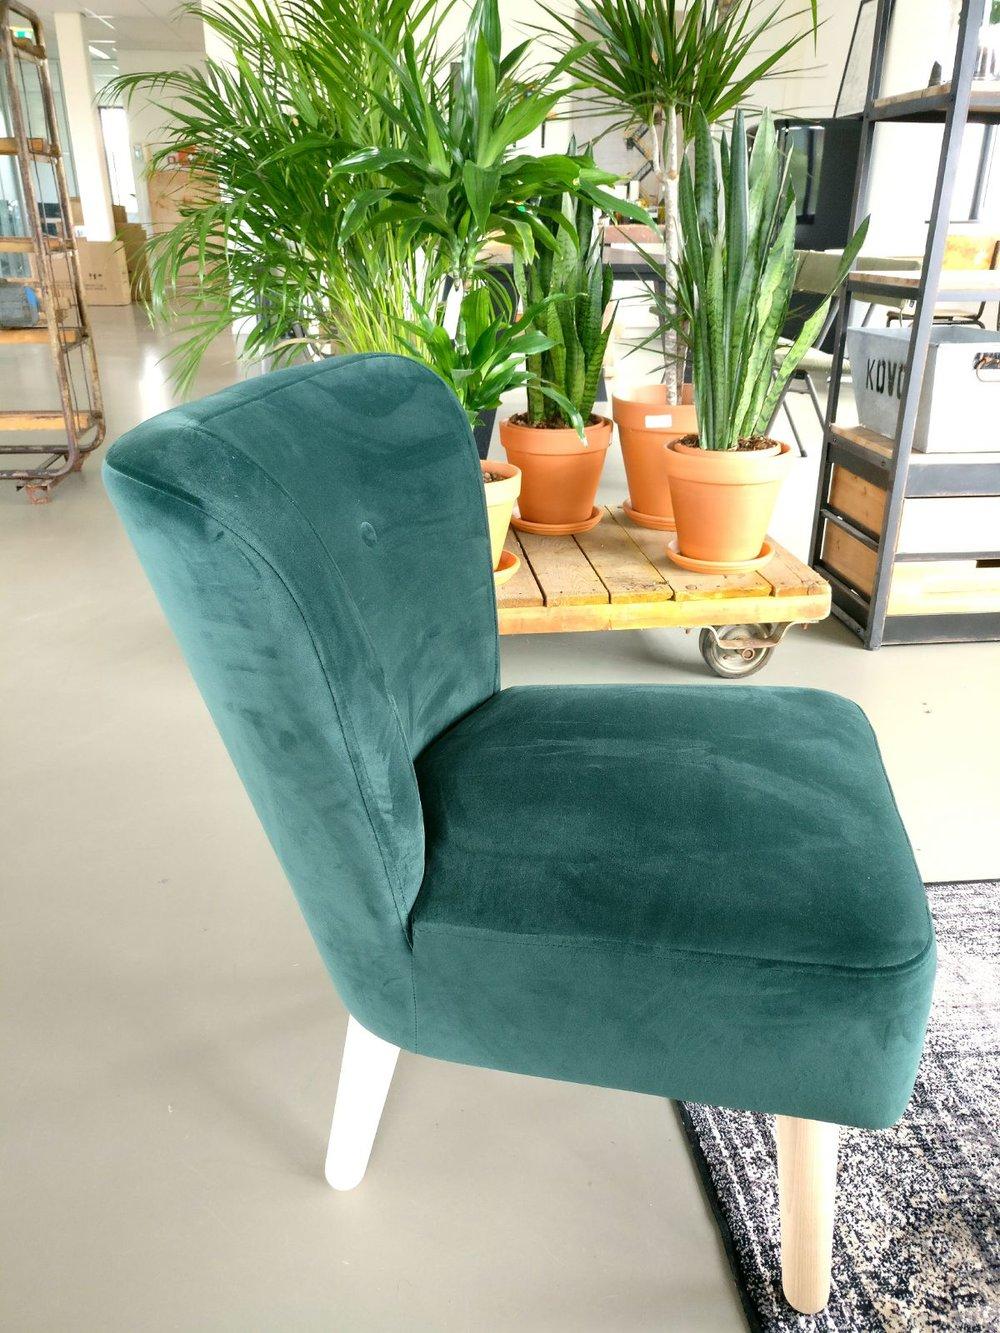 moderne kantoorruimte velvet stoel fluweel licht en planten trolley urban jungle.jpg